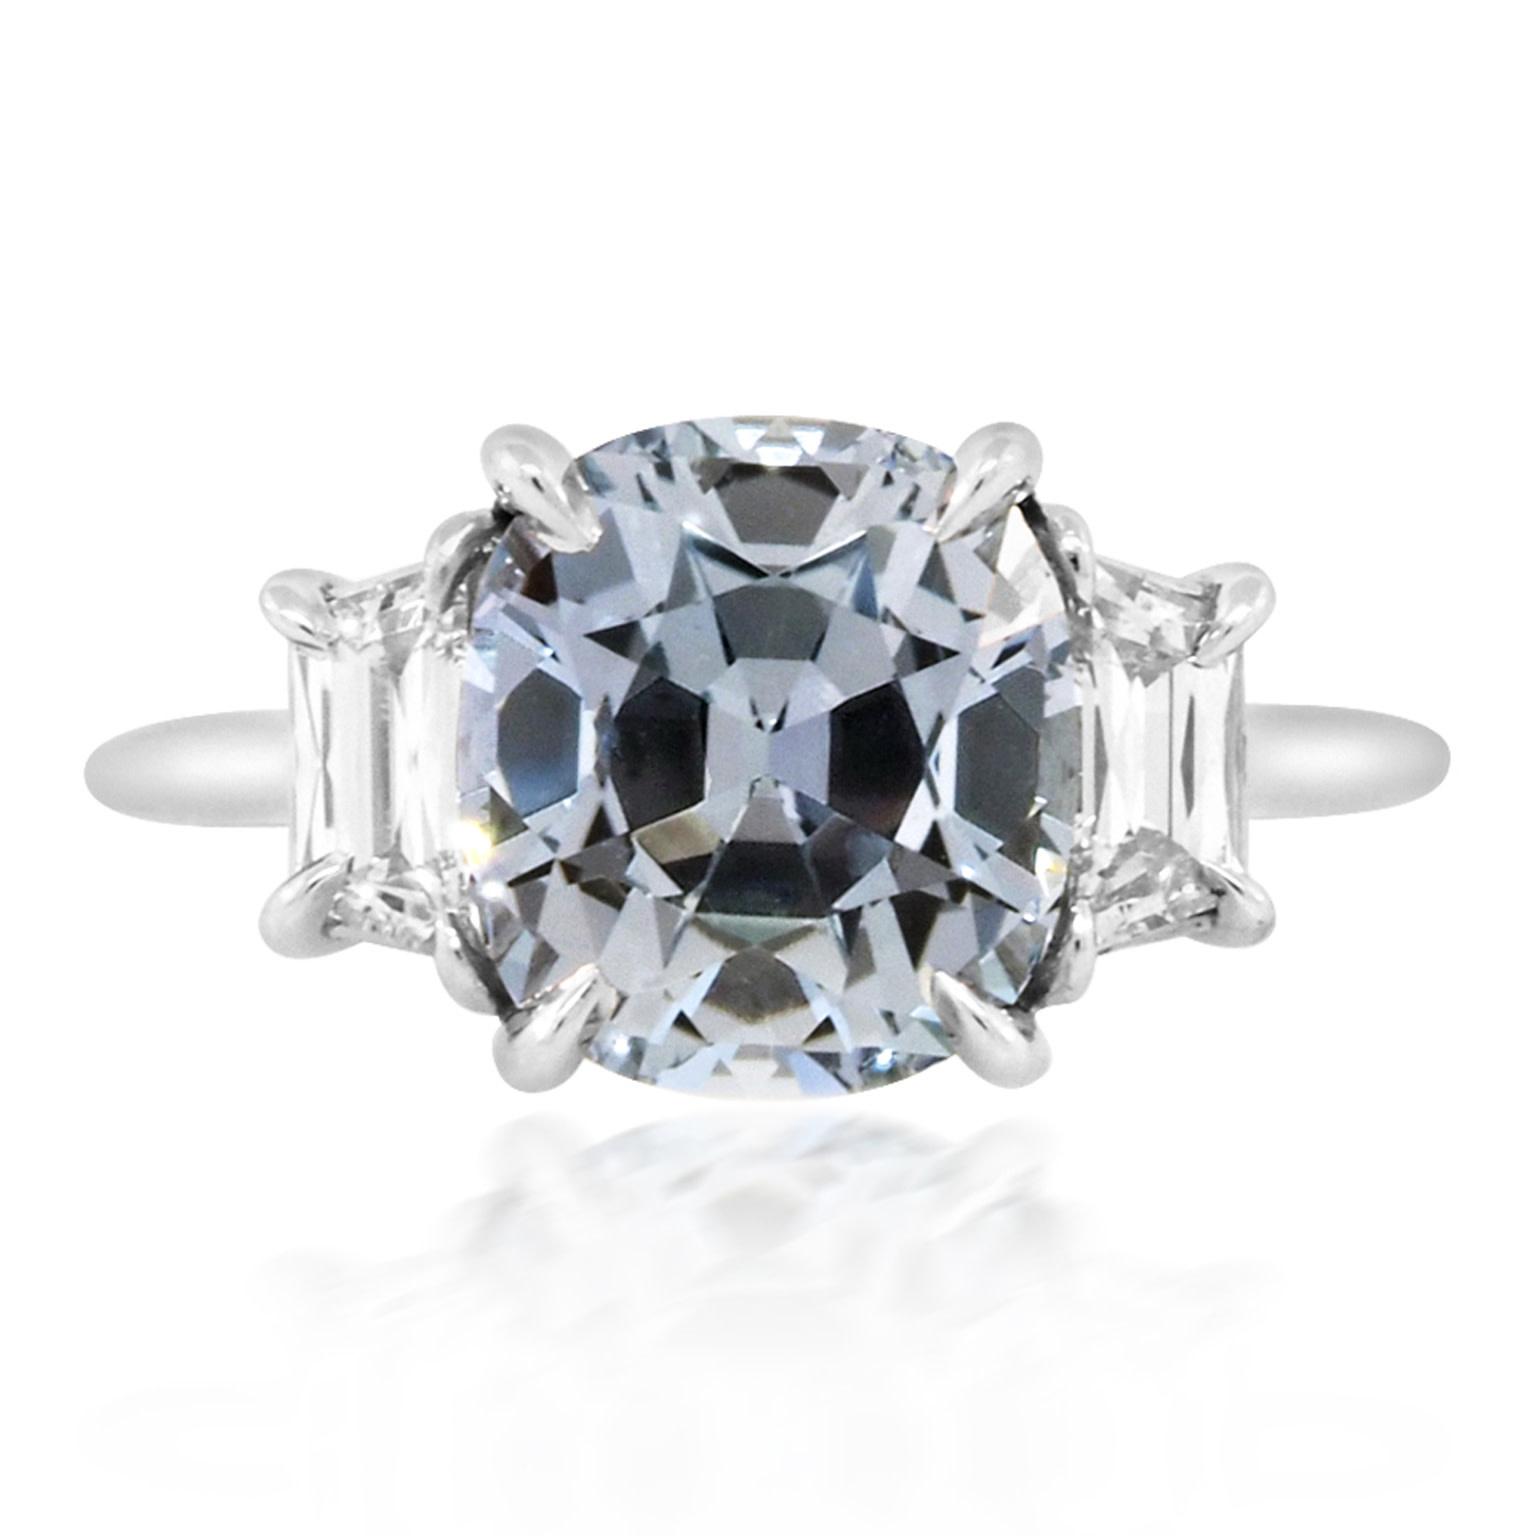 Trabert Goldsmiths 4.39ct Pale Blue Sapphire Twilight Ring